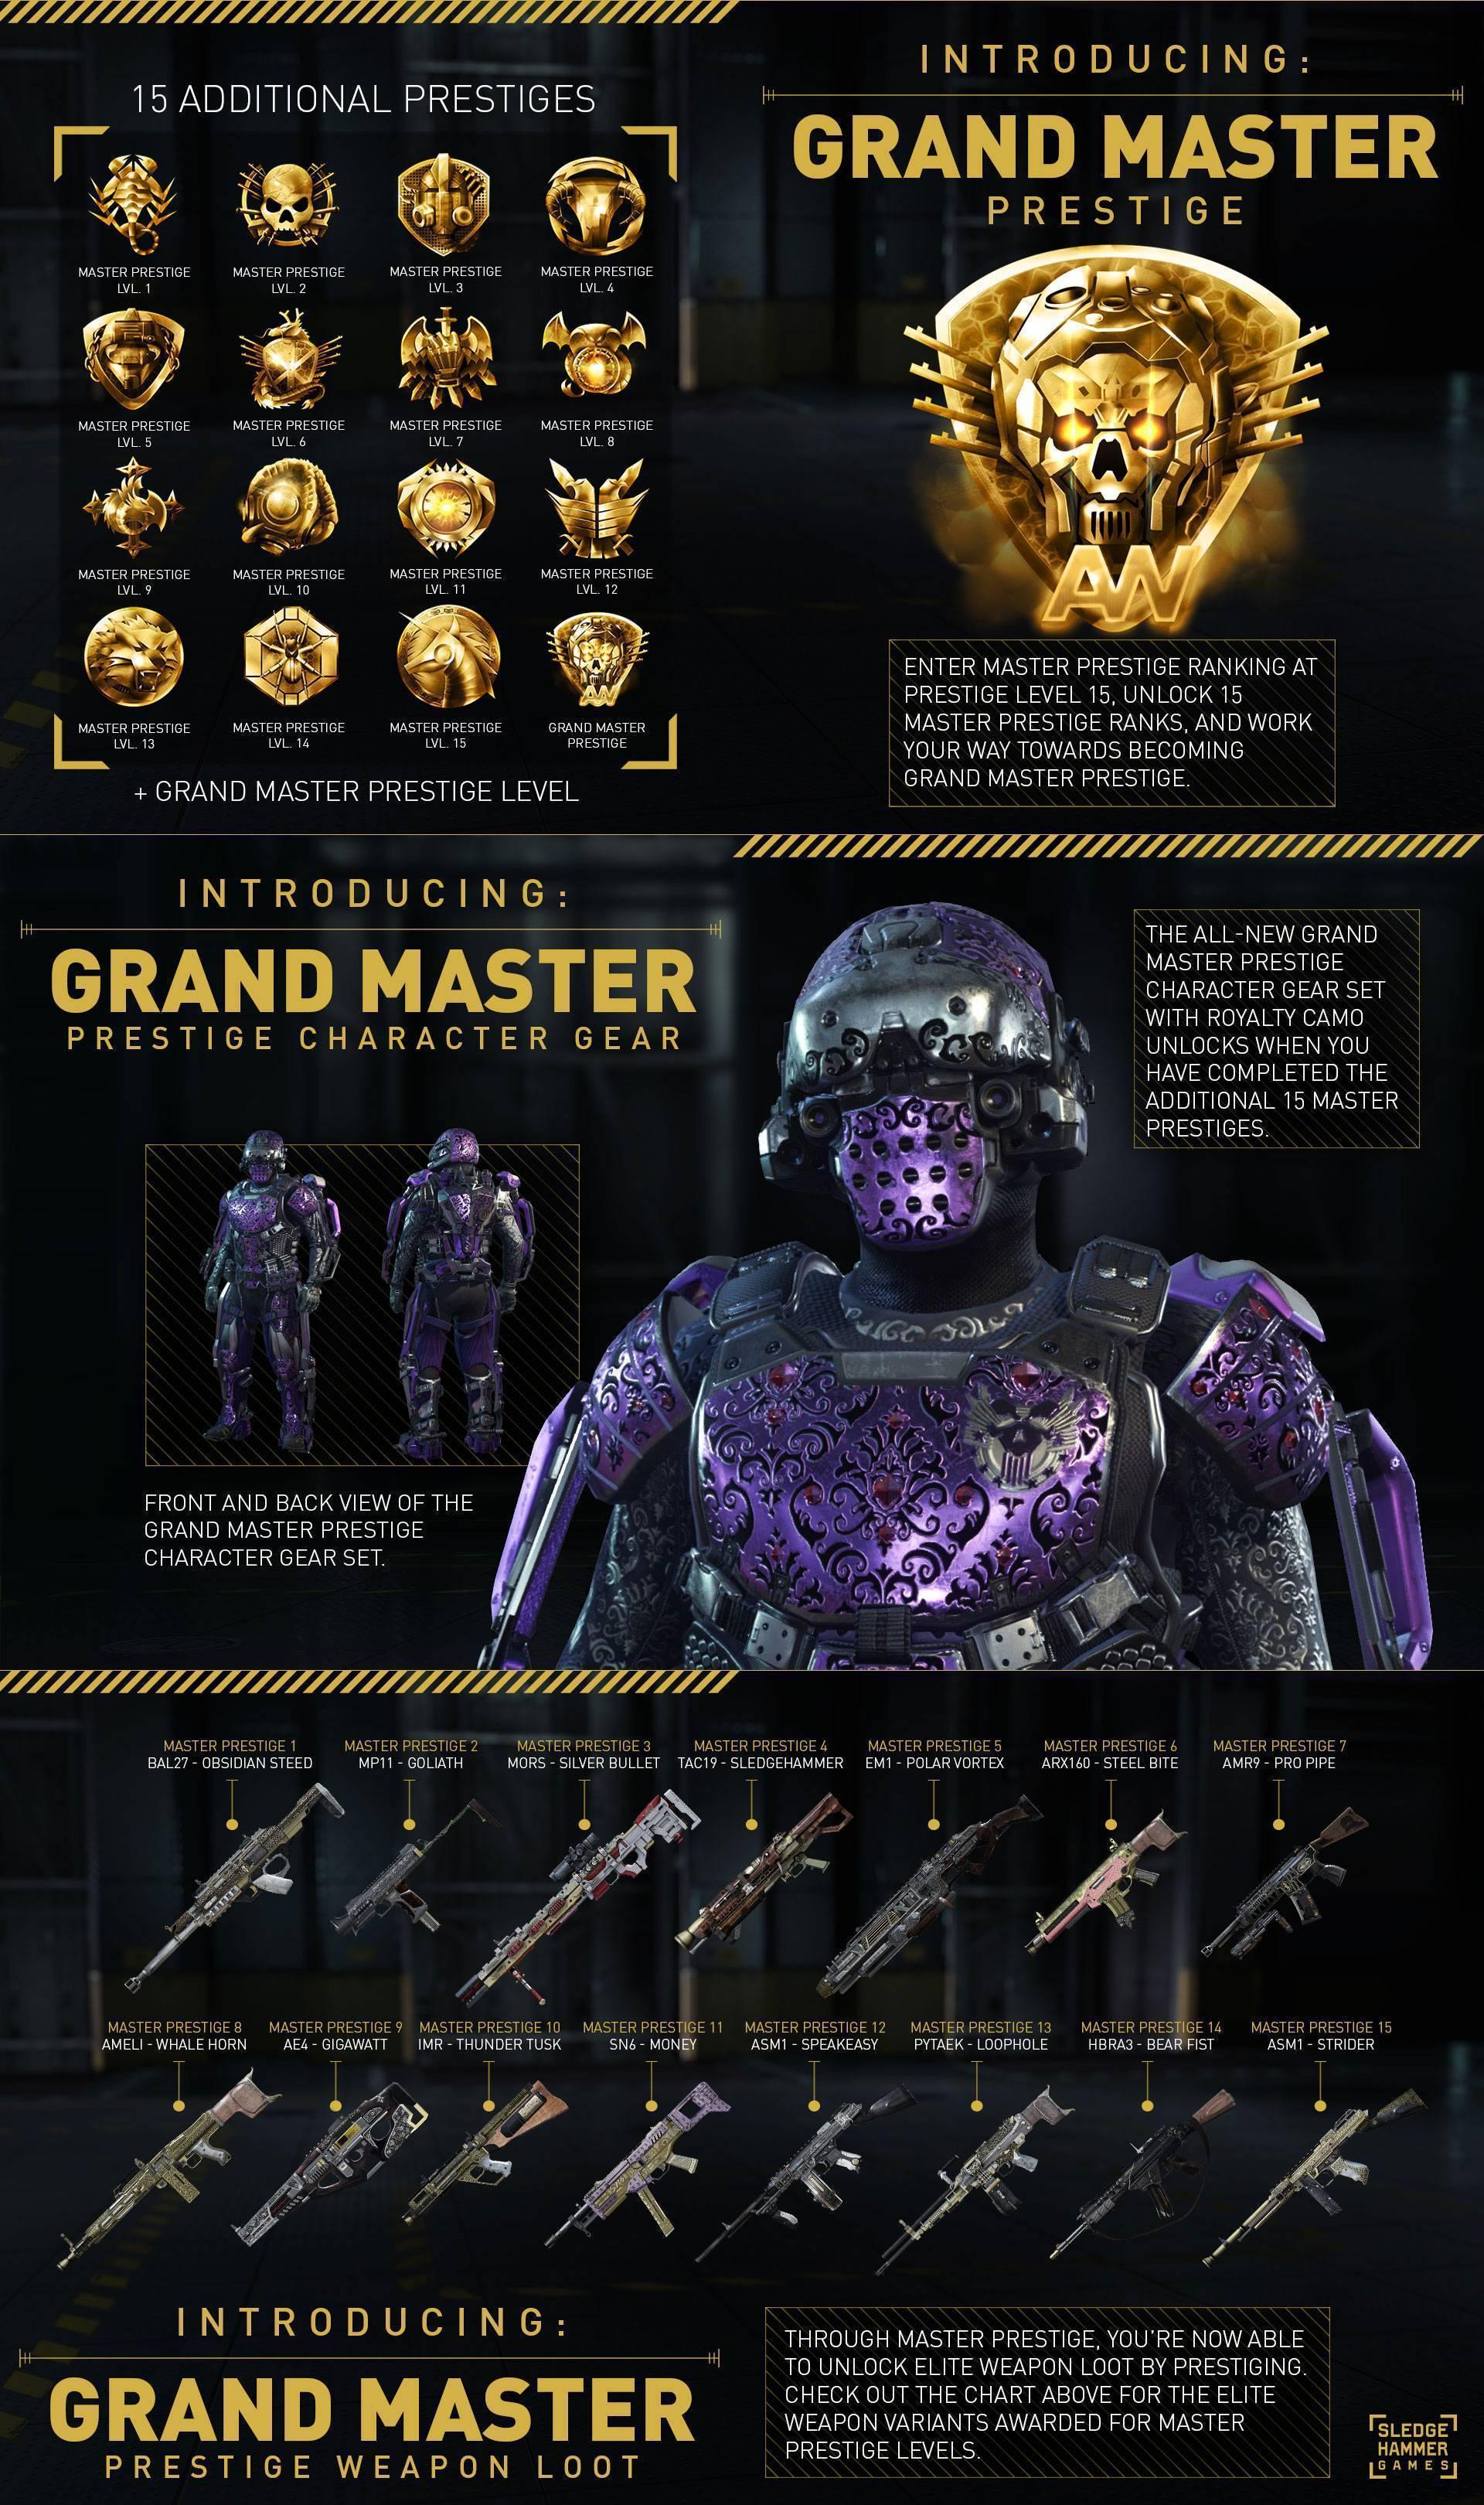 aw prestige infographic